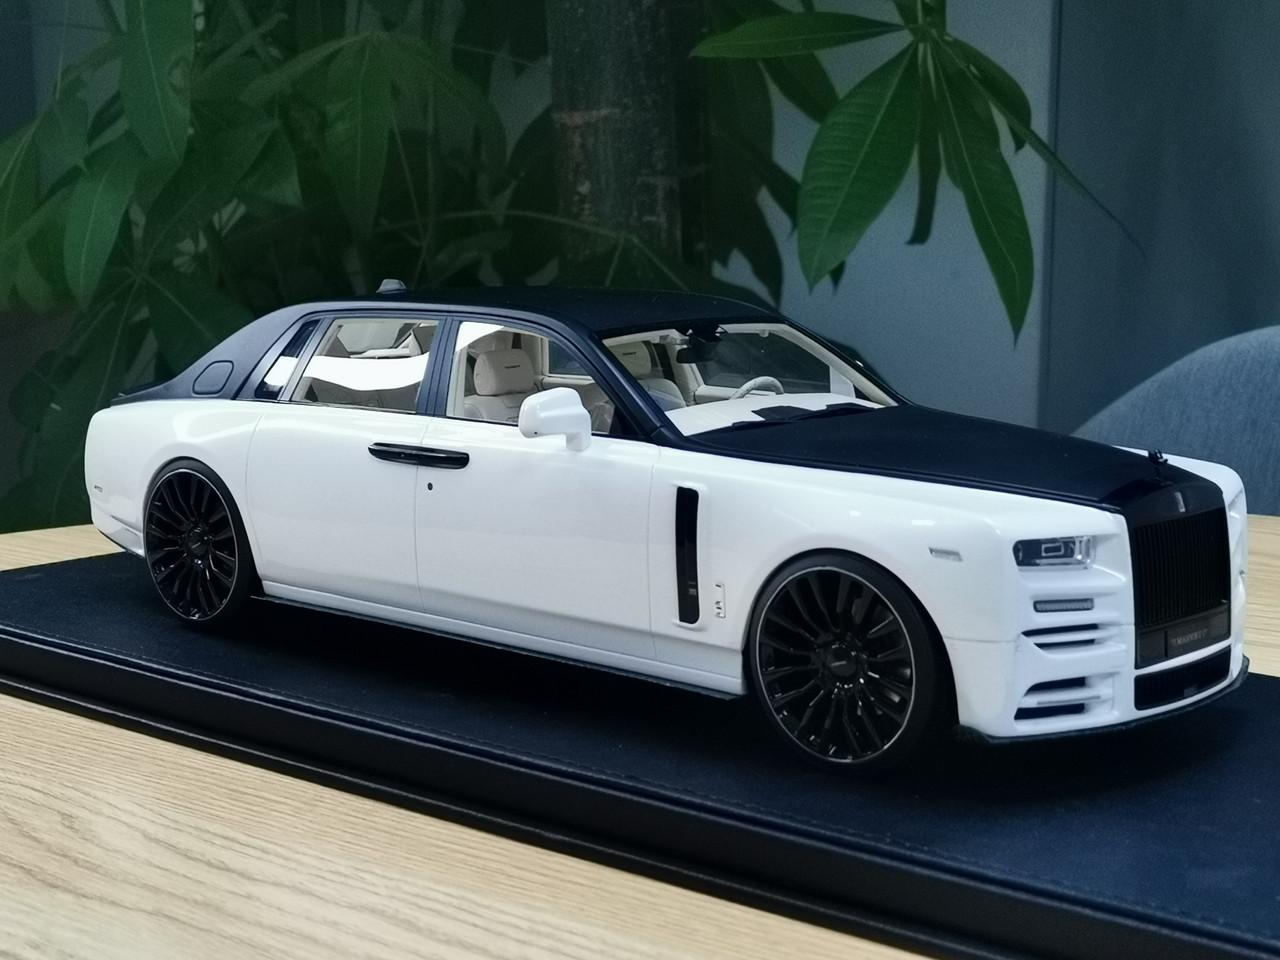 1 18 Mansory Rolls Royce Rr Phantom Viii White Black Resin Car Model Limited 99 Pieces Livecarmodel Com